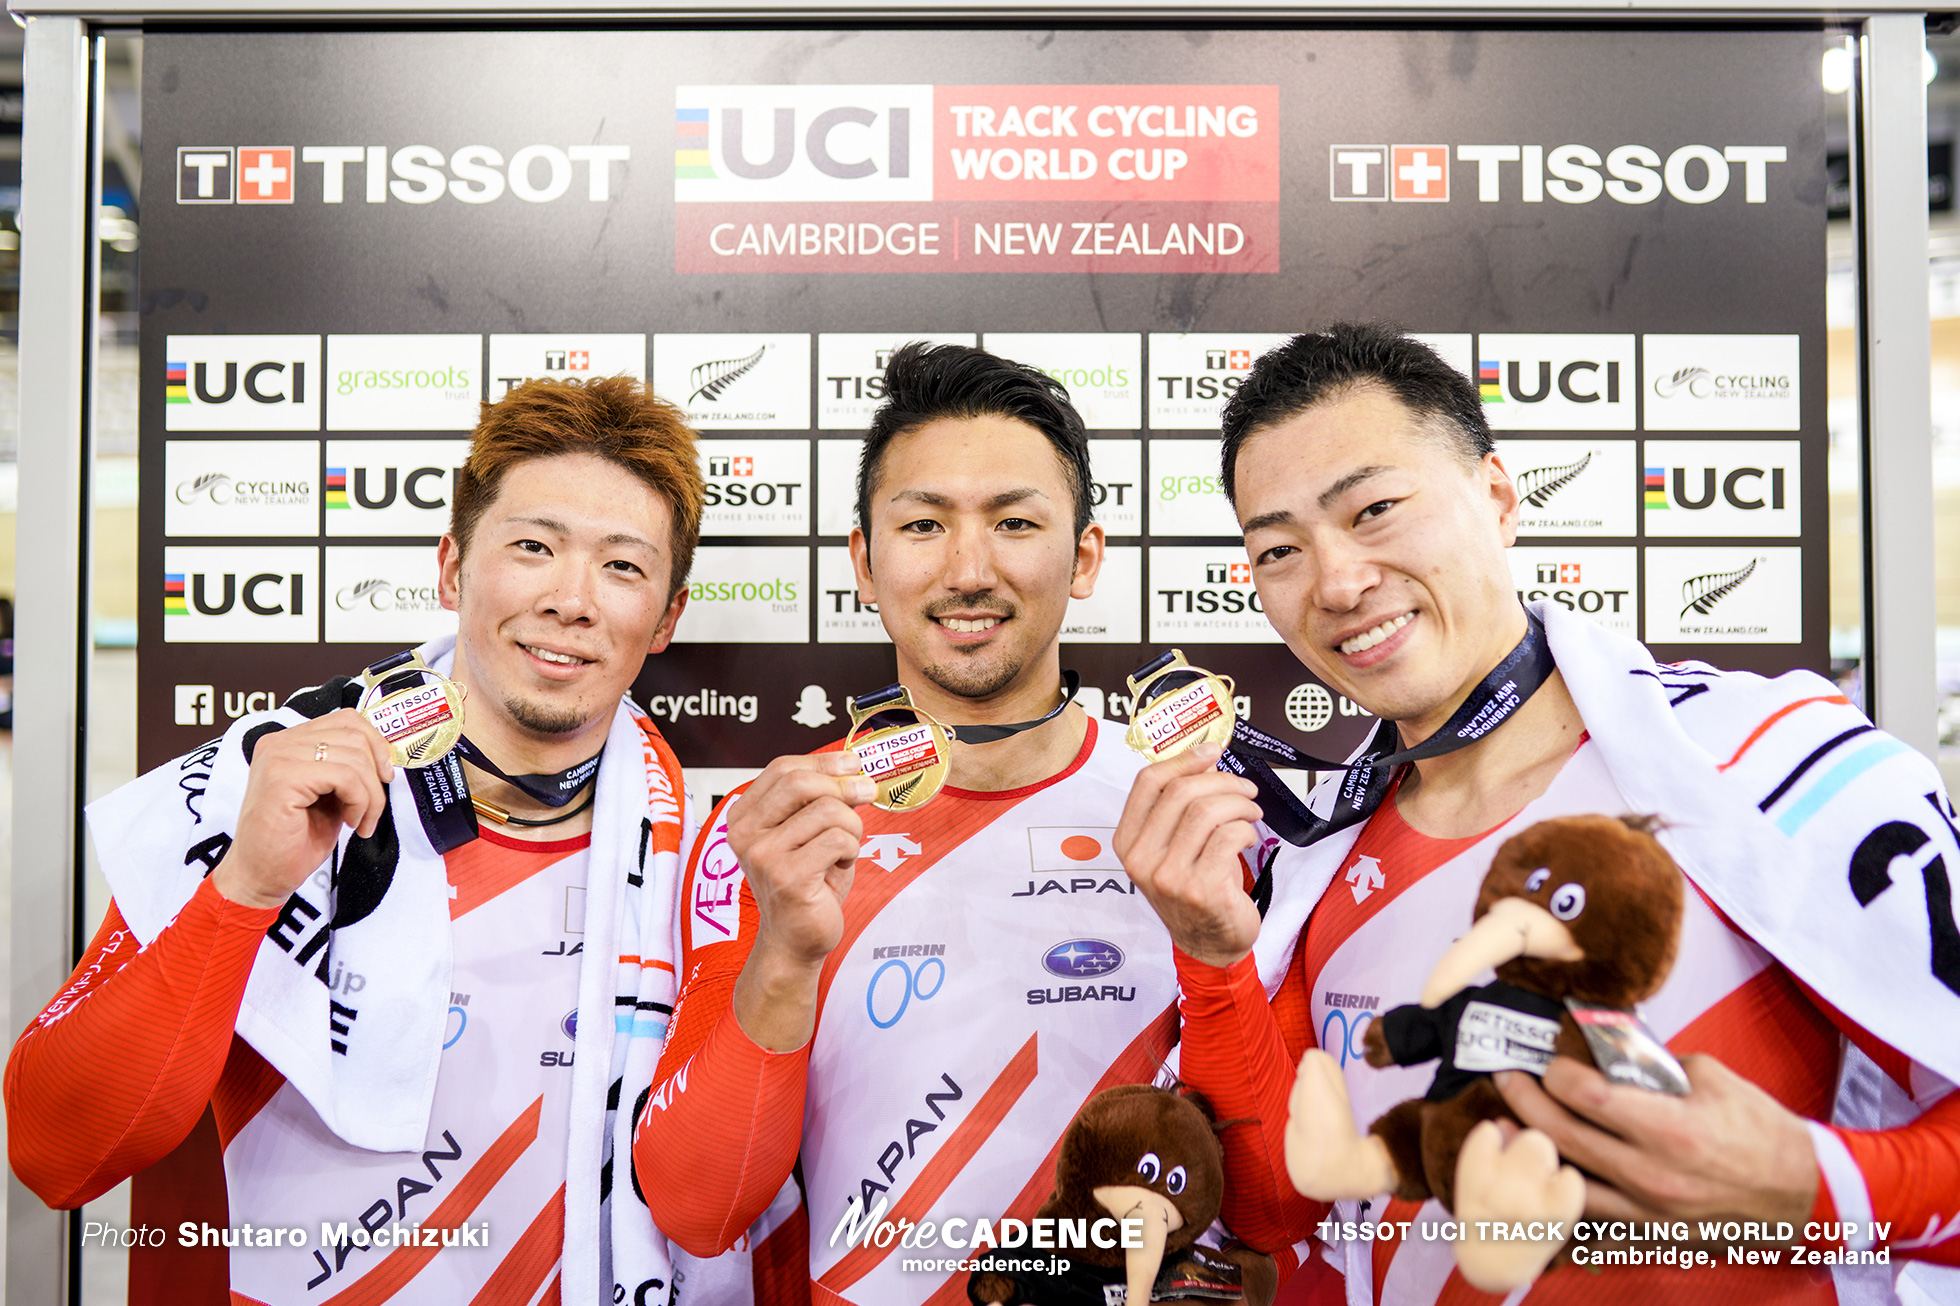 Men's Team Sprint / TISSOT UCI TRACK CYCLING WORLD CUP IV, Cambridge, New Zealand, 深谷知広 新田祐大 雨谷一樹